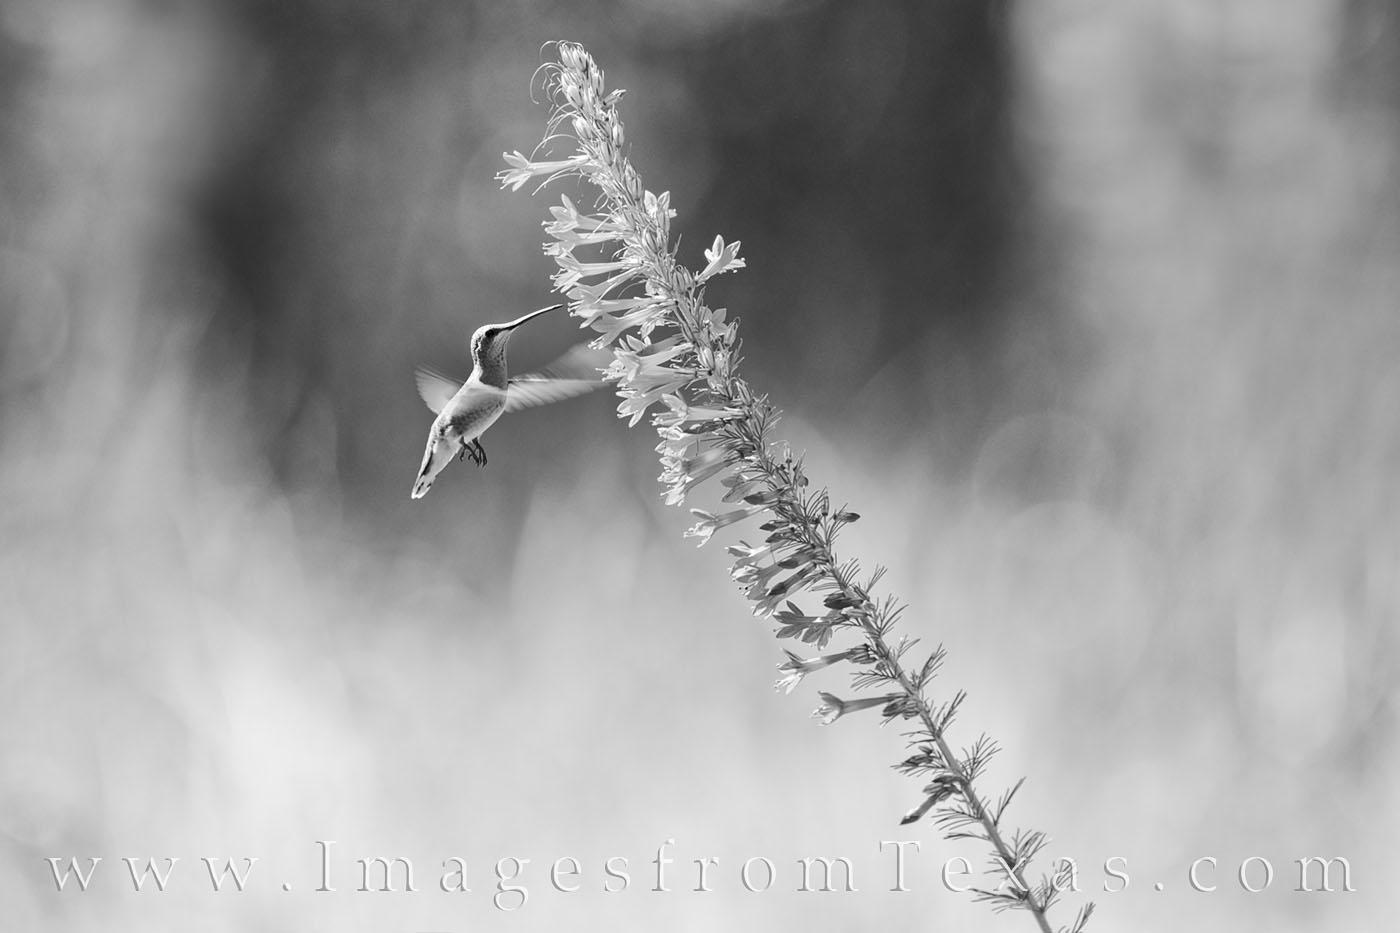 hummingbird, wildflowers, hummers, summer, texas hummingbirds, black and white, photo